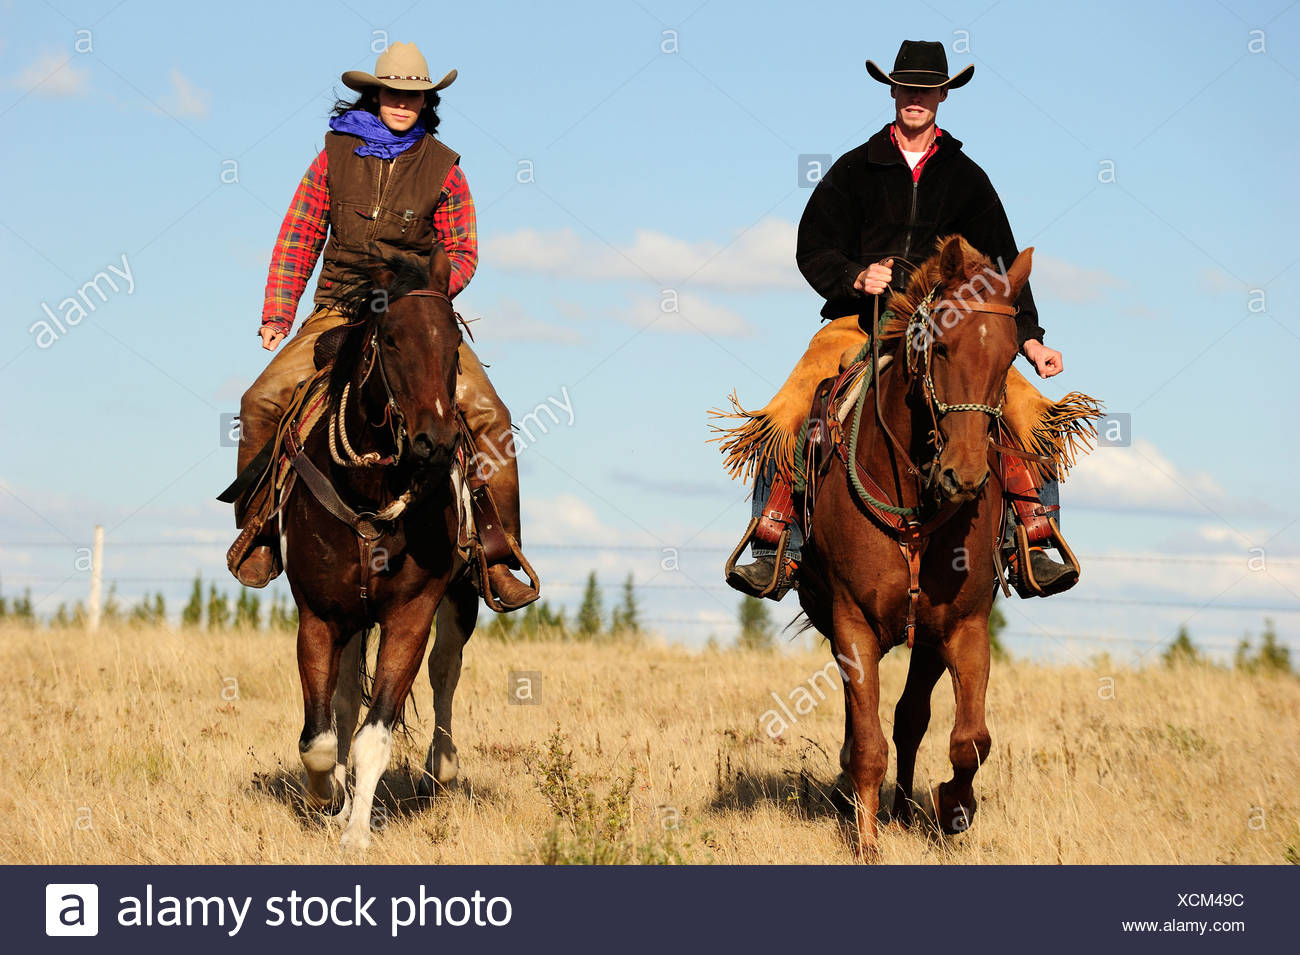 Two Cowboys Riding Horses Stock Photos Amp Two Cowboys